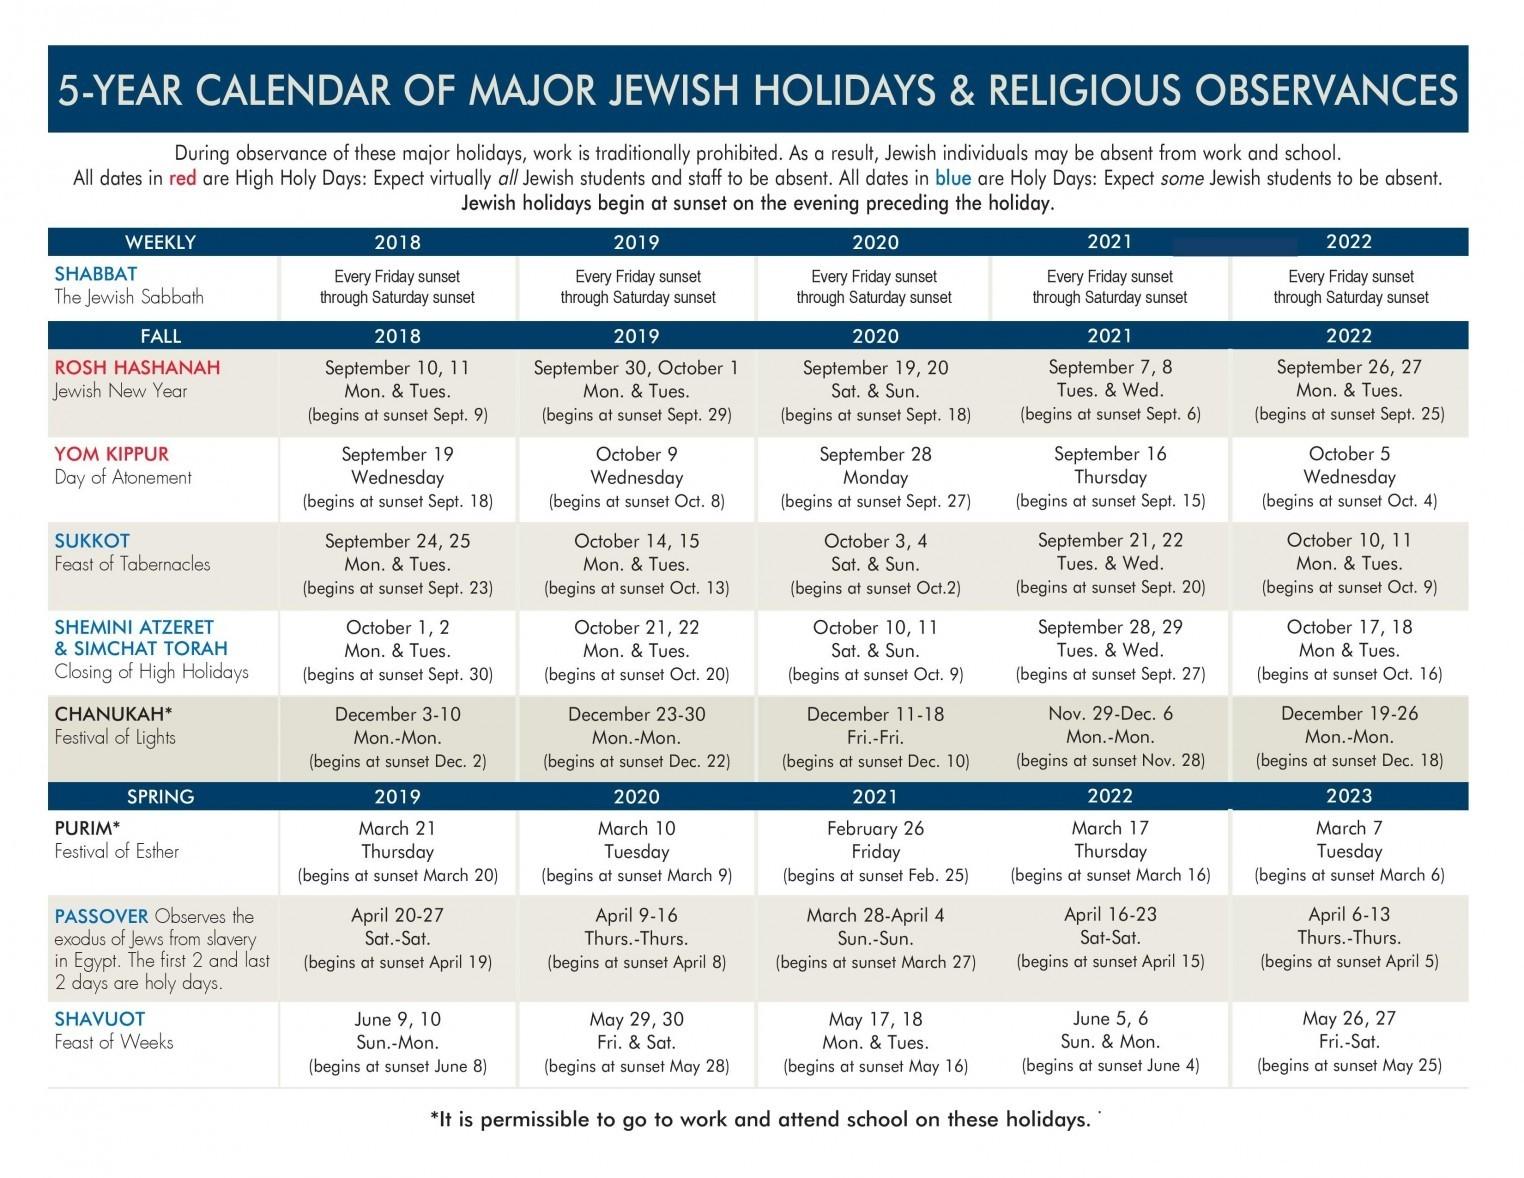 5-Year Jewish Holiday Calendar | Jewish Federation Of-Calendar Of Jewish Holidays 2020